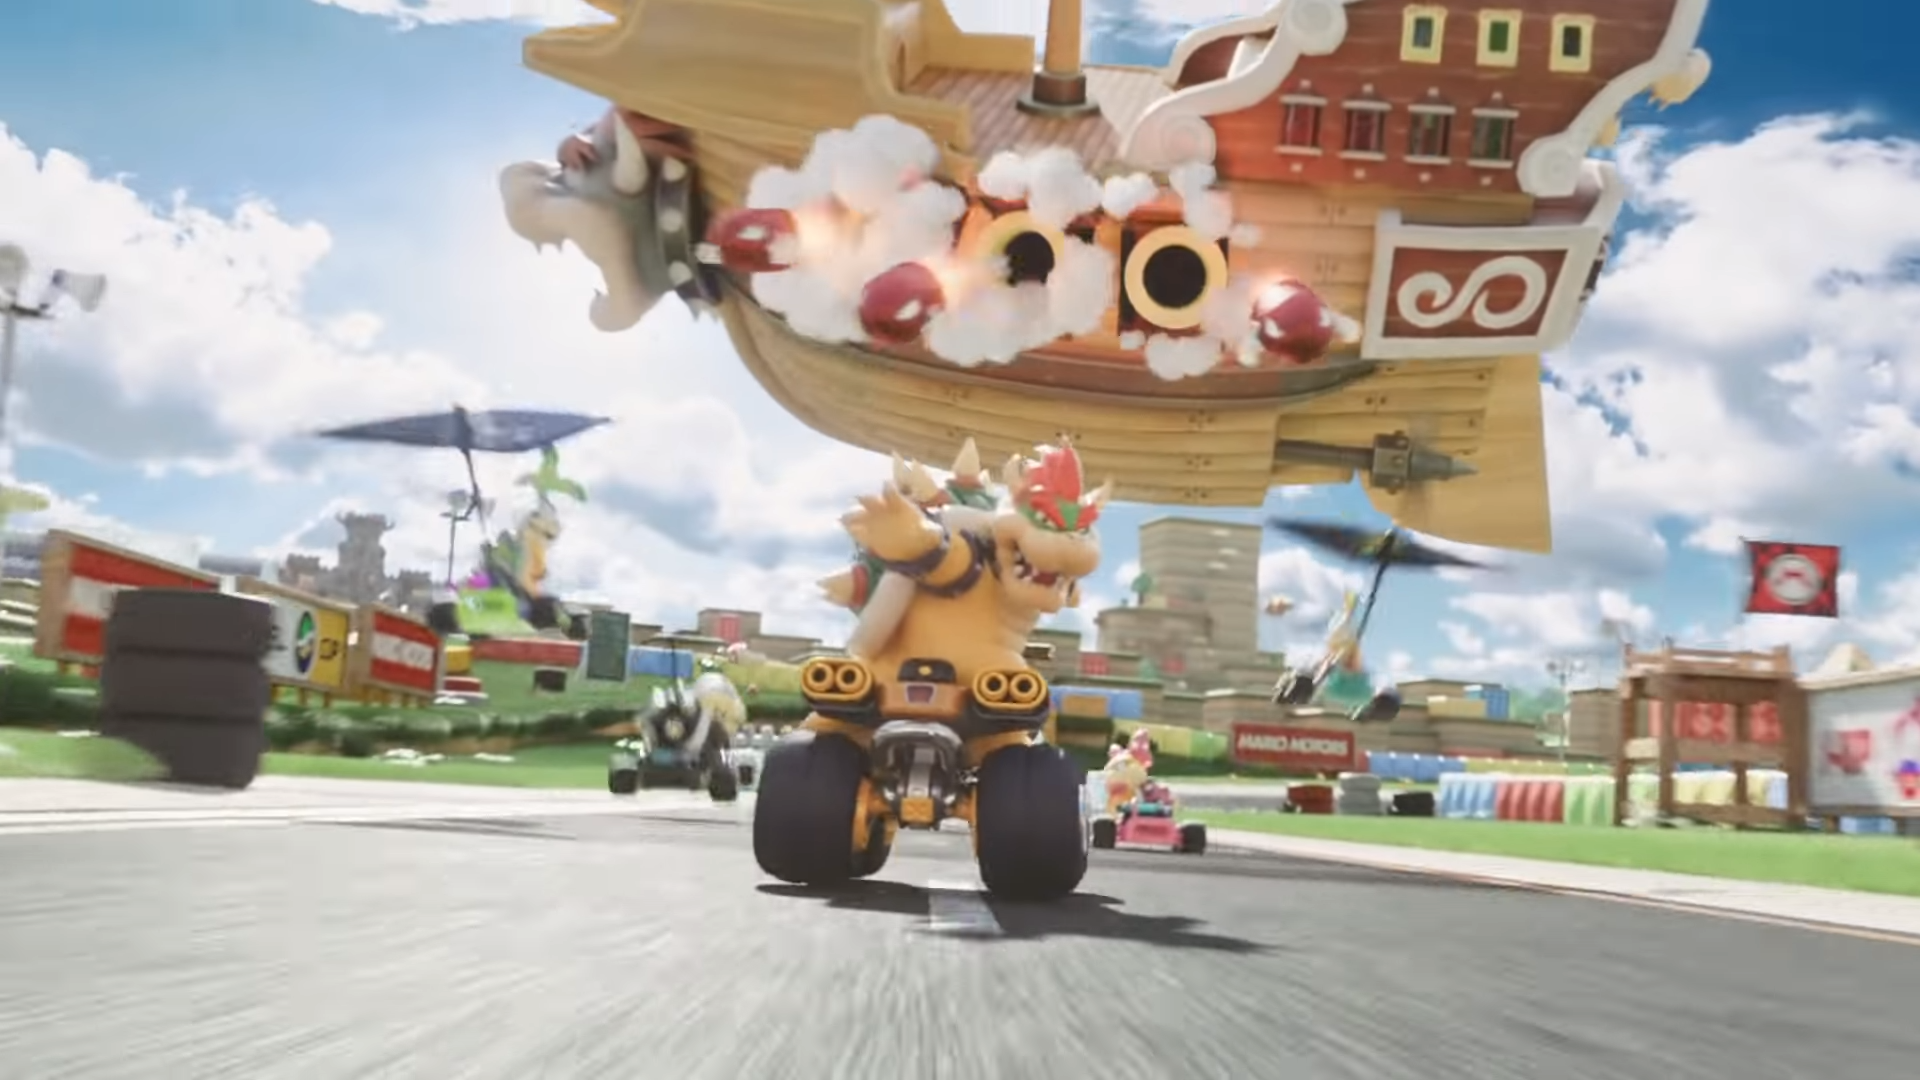 Universal Studios Japan Reveals New Details On Super Nintendo World Inside Universal